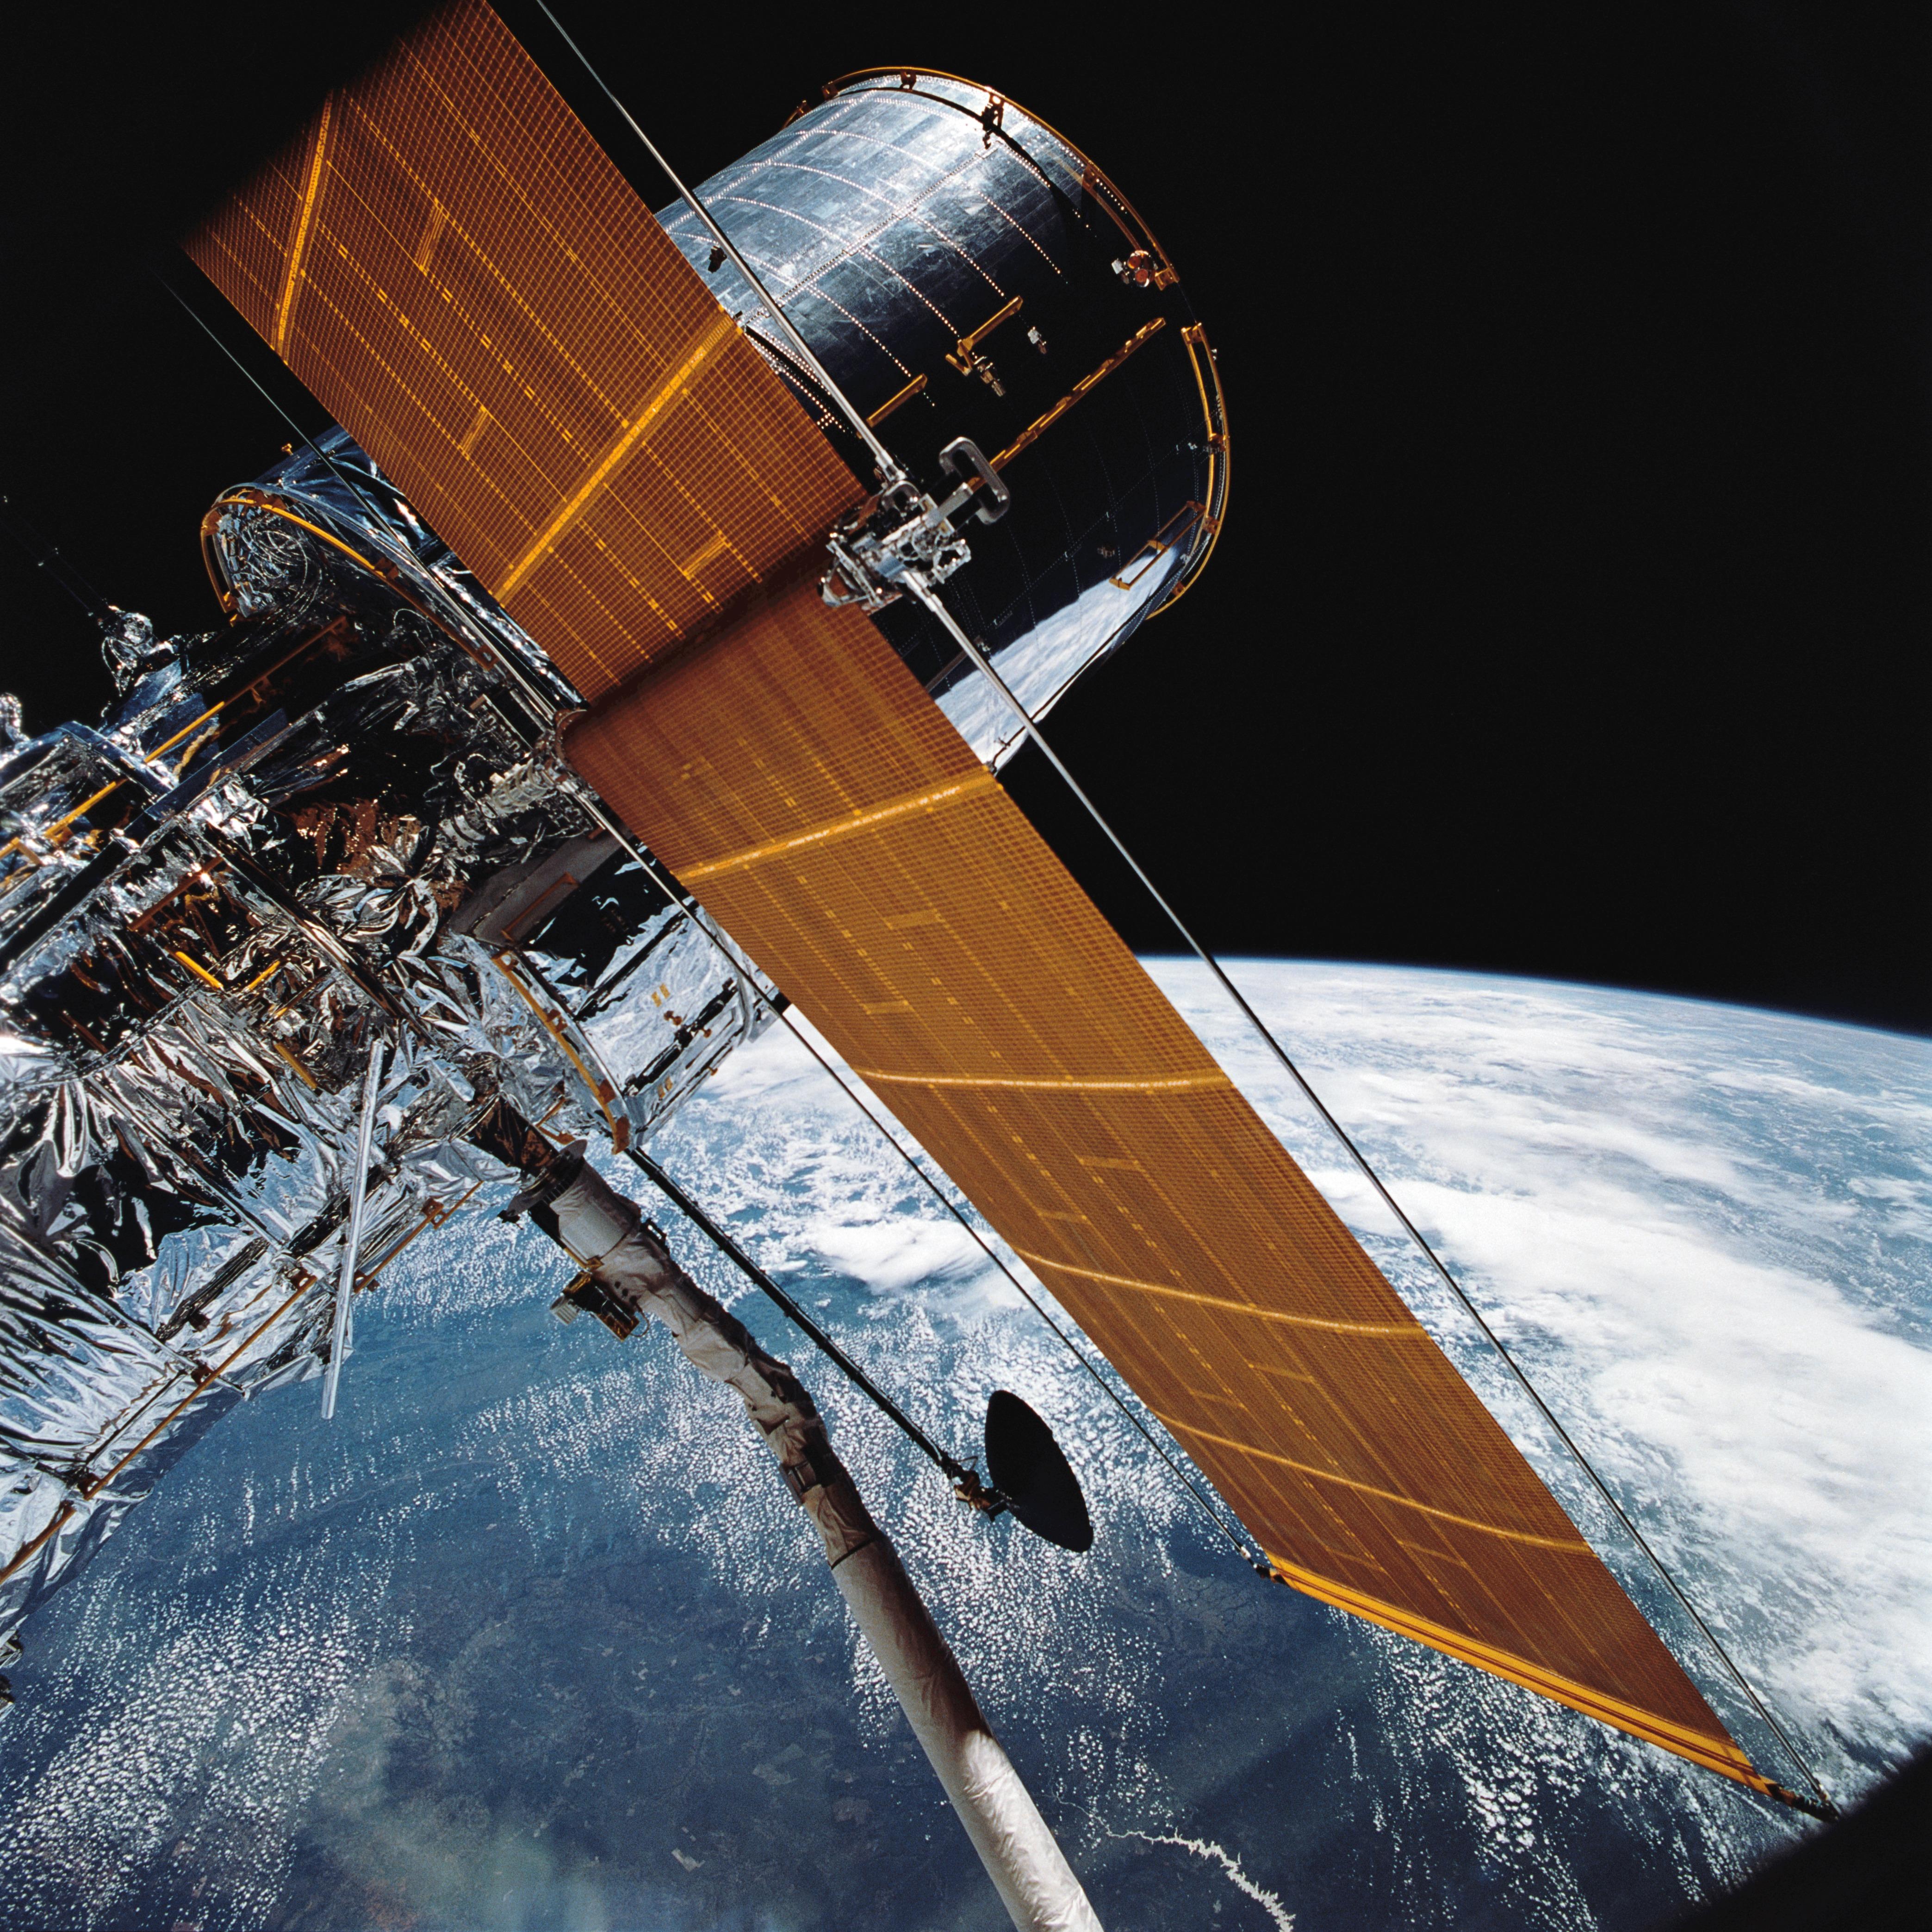 space shuttle hubble telescope - photo #29